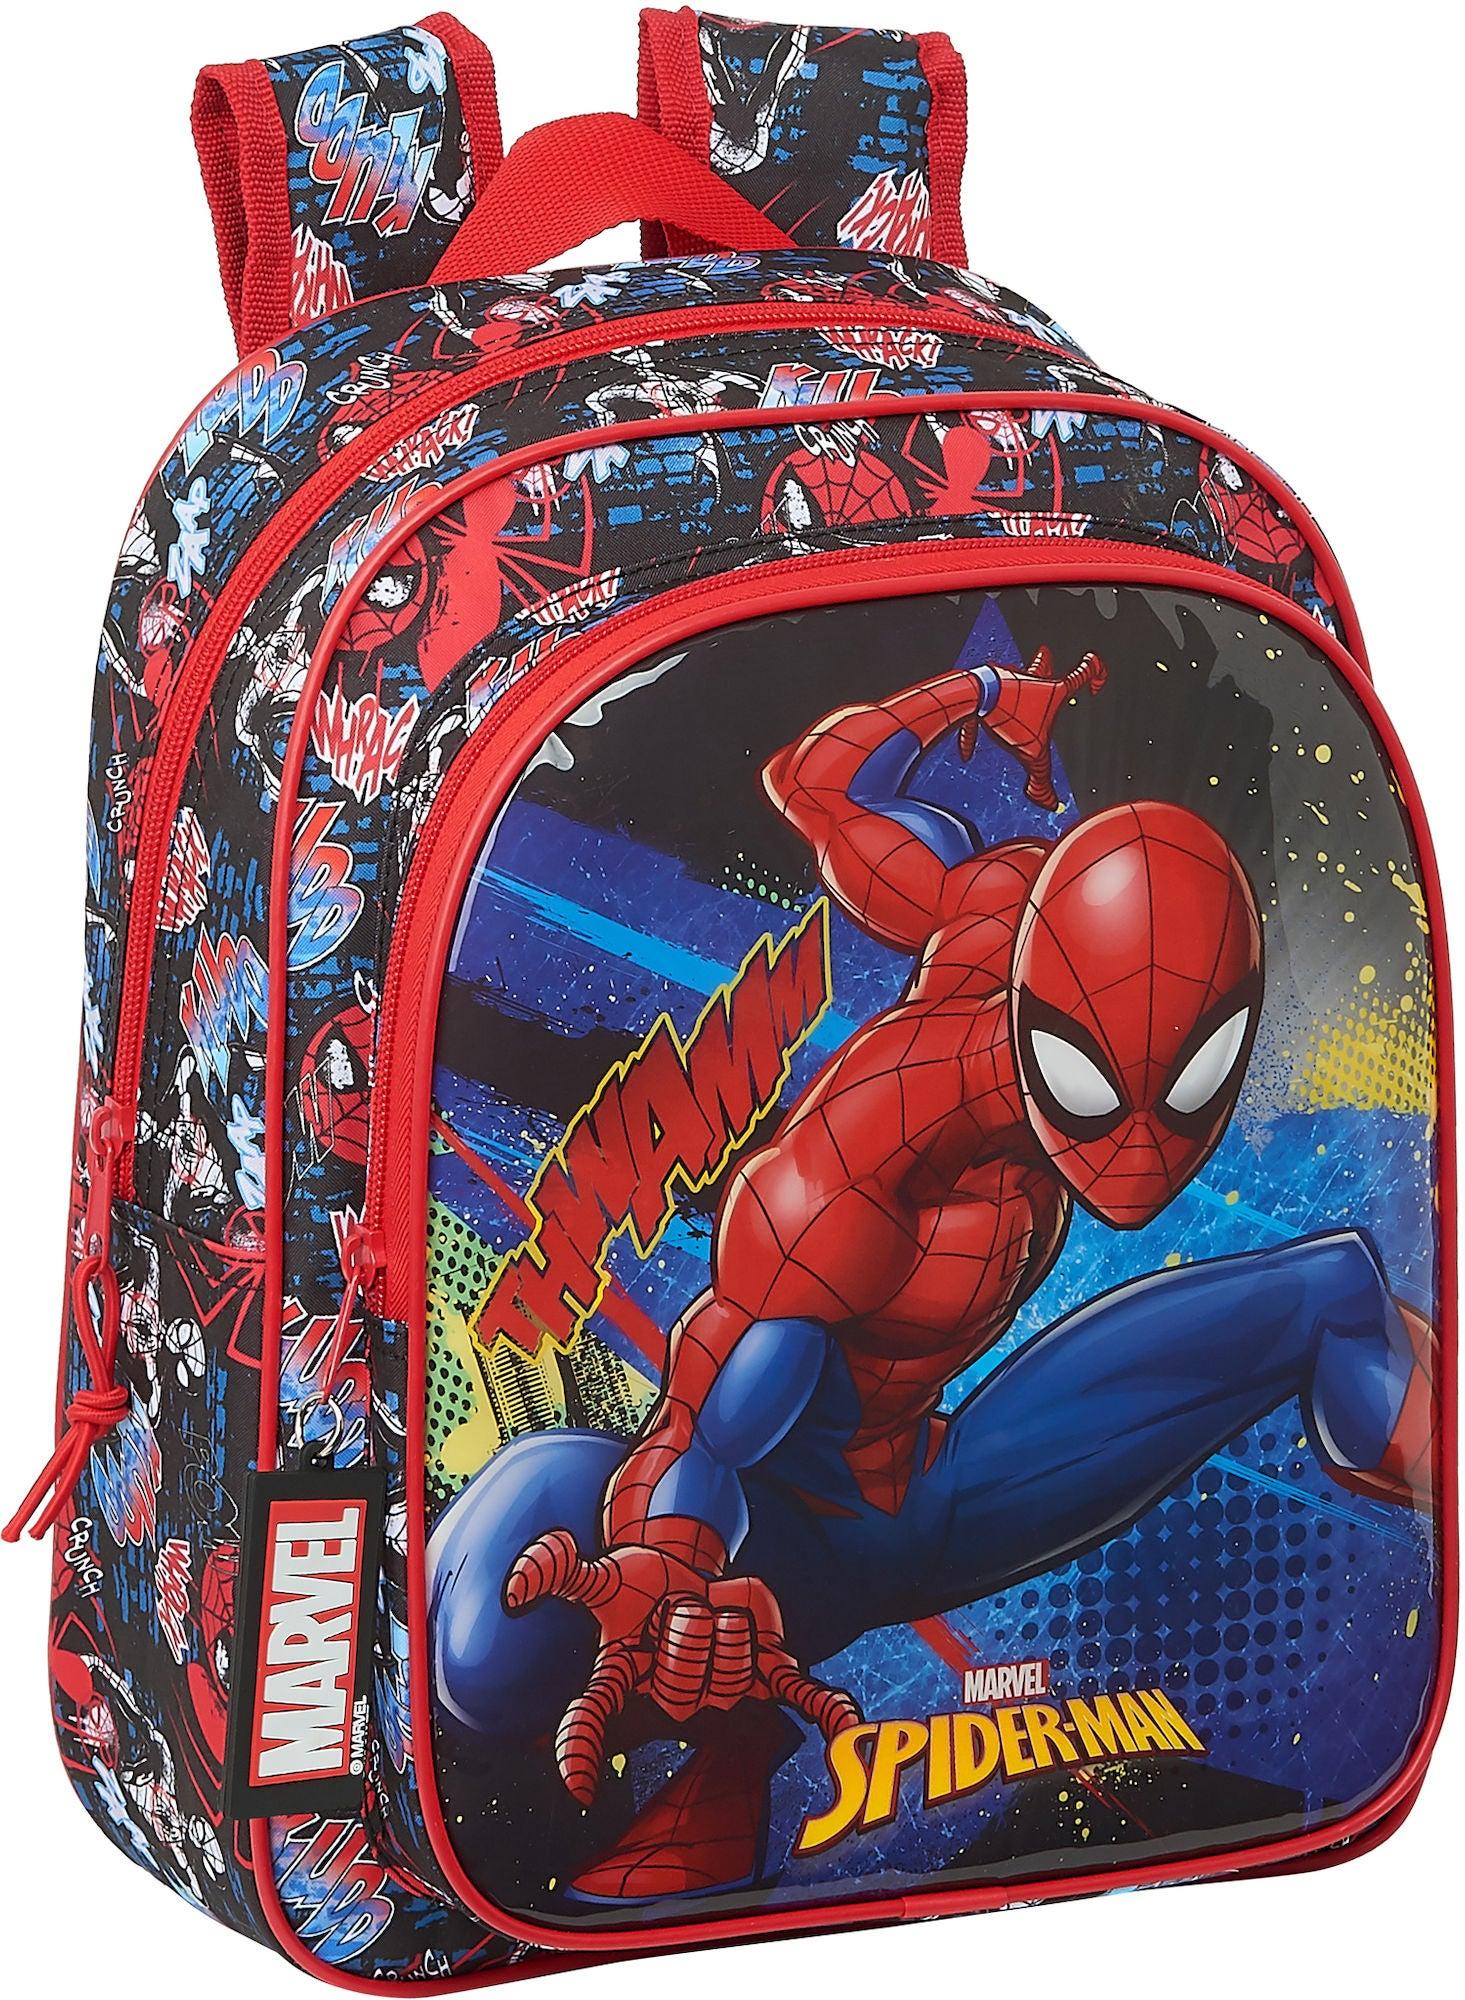 Marvel Spider-Man Go Hero Ryggsäck 9L, Red